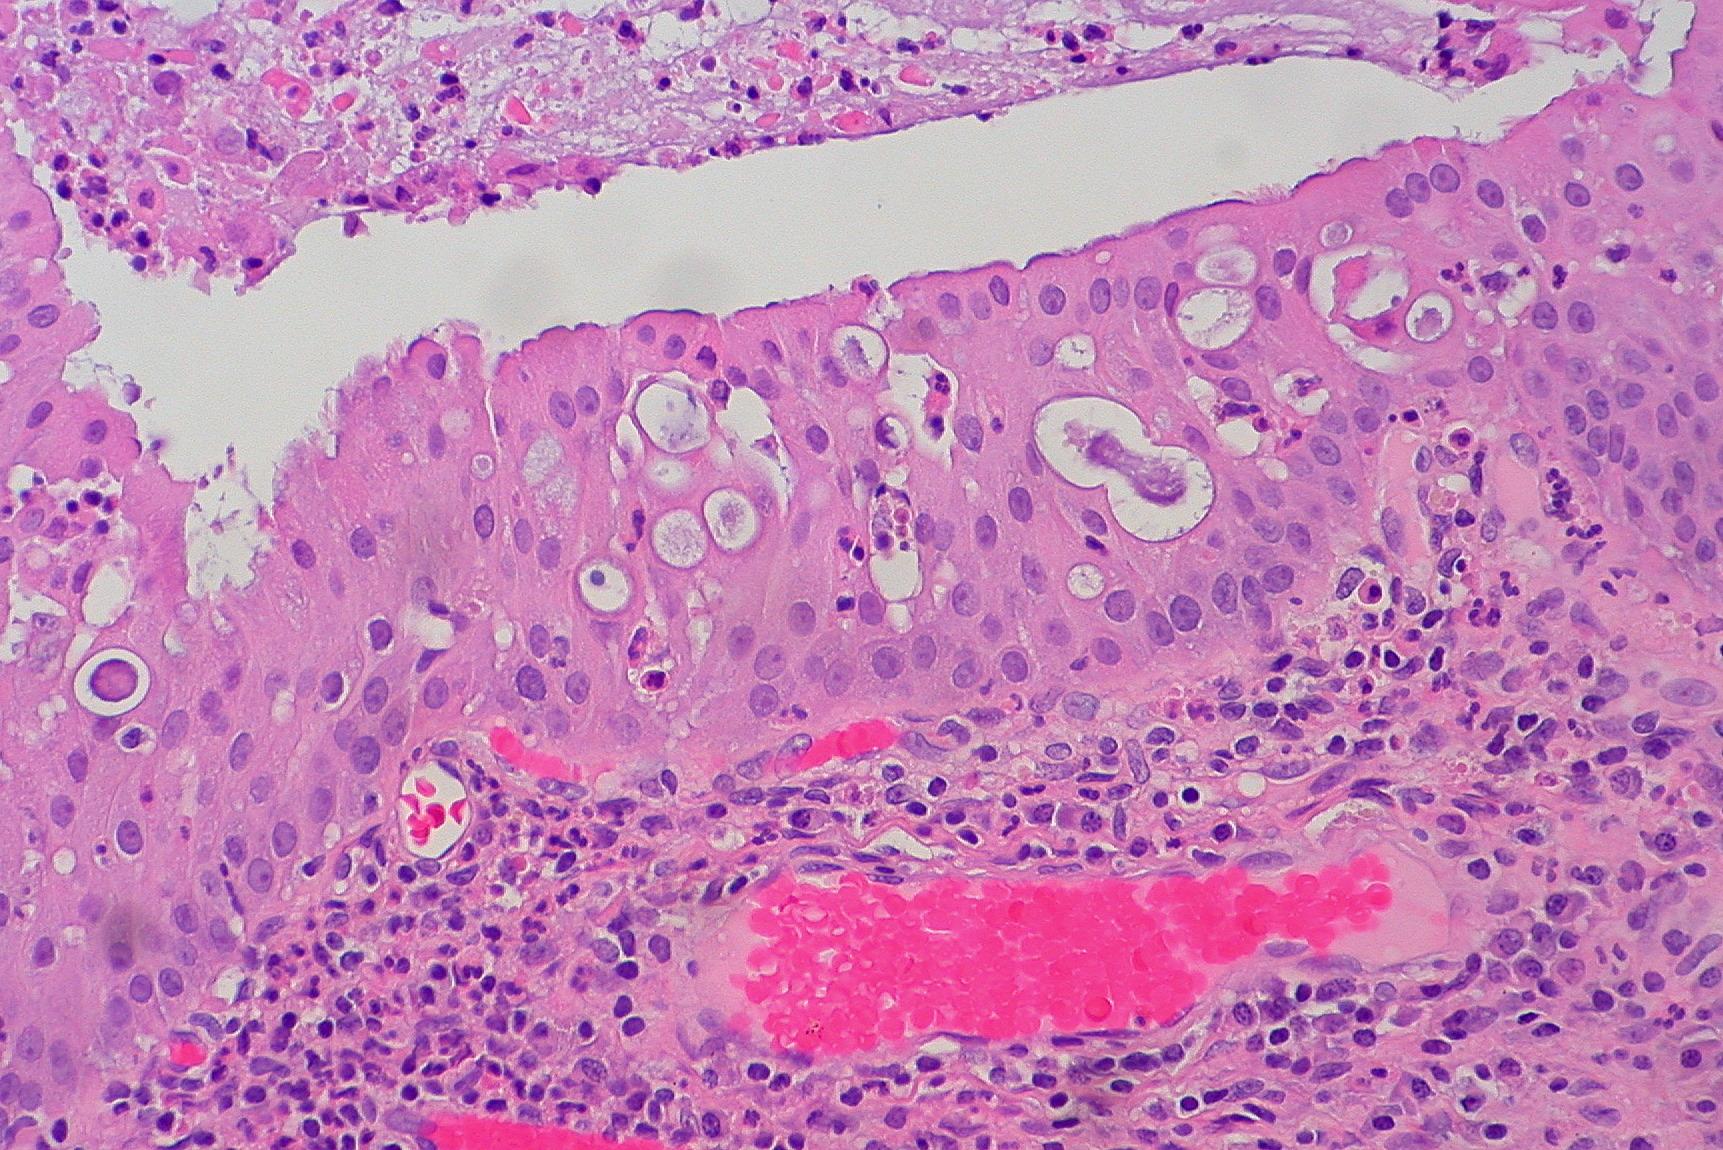 sinonasal oncocytic papilloma hpv labia cancer